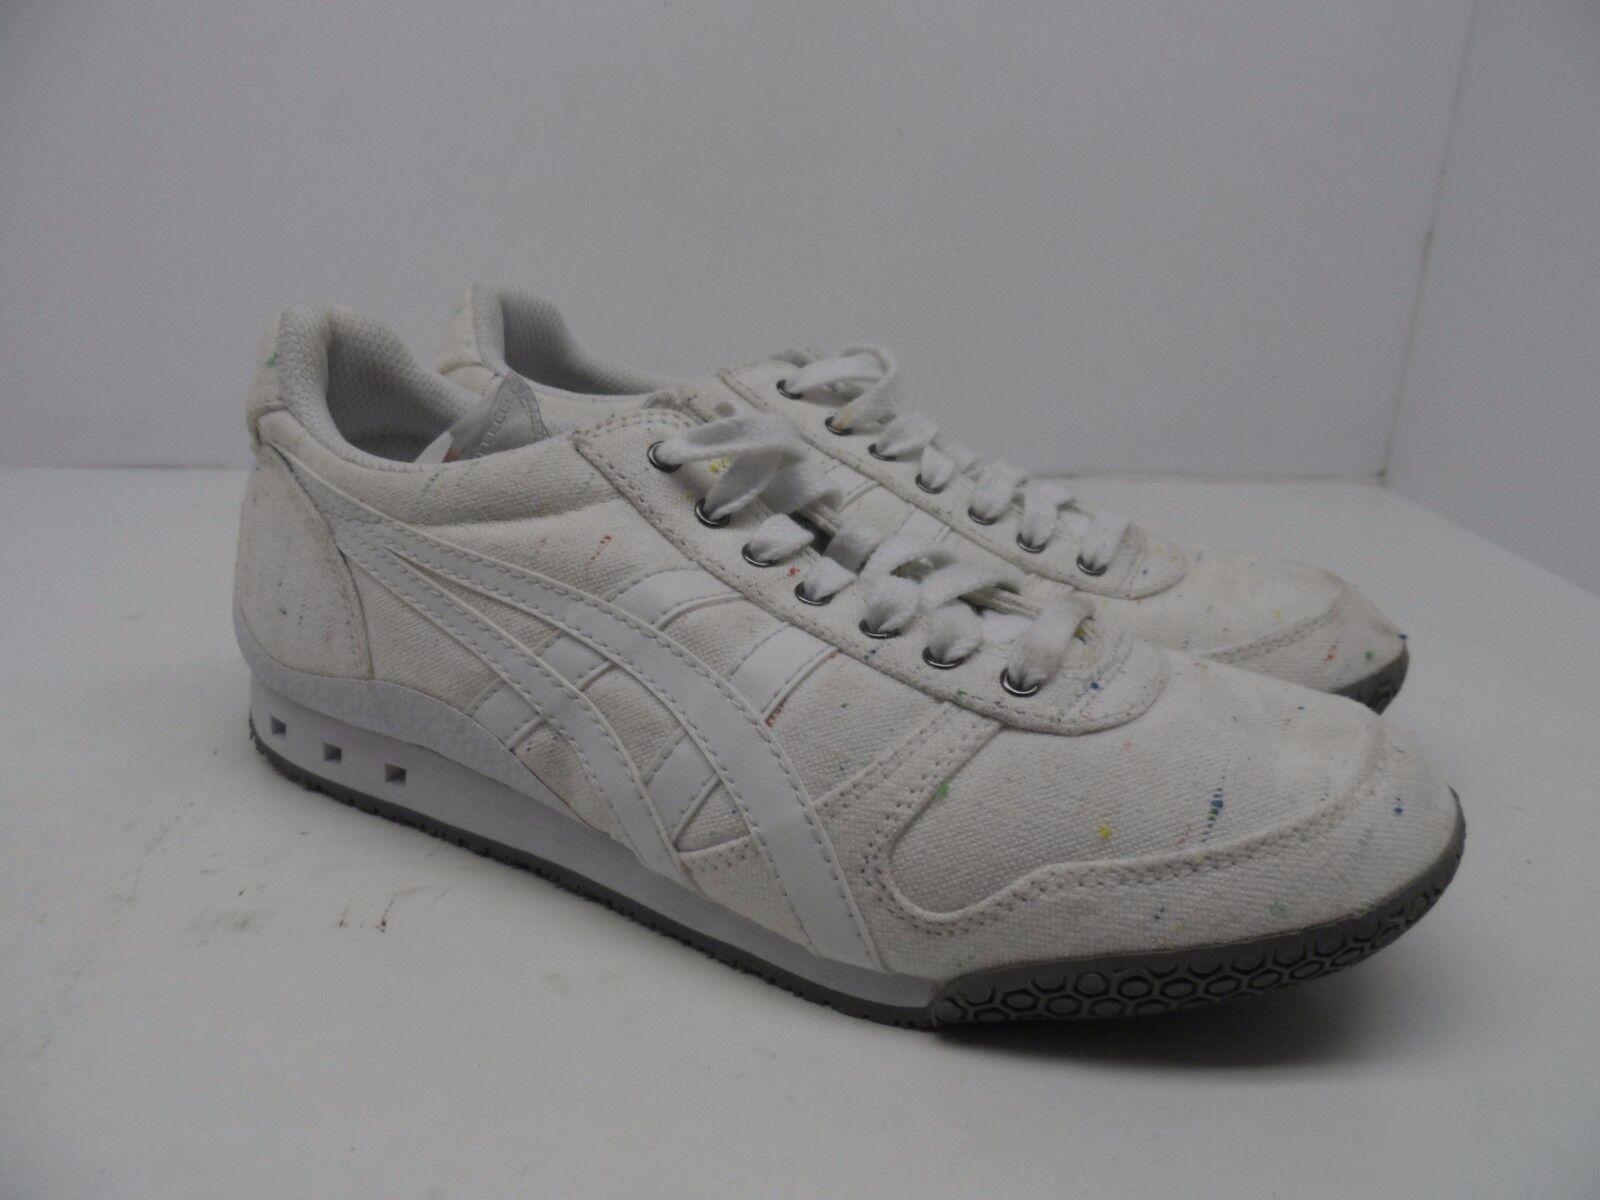 ASICS Women's Ultimate 81 Athletic Fashion Running shoes White Multi Size 7M